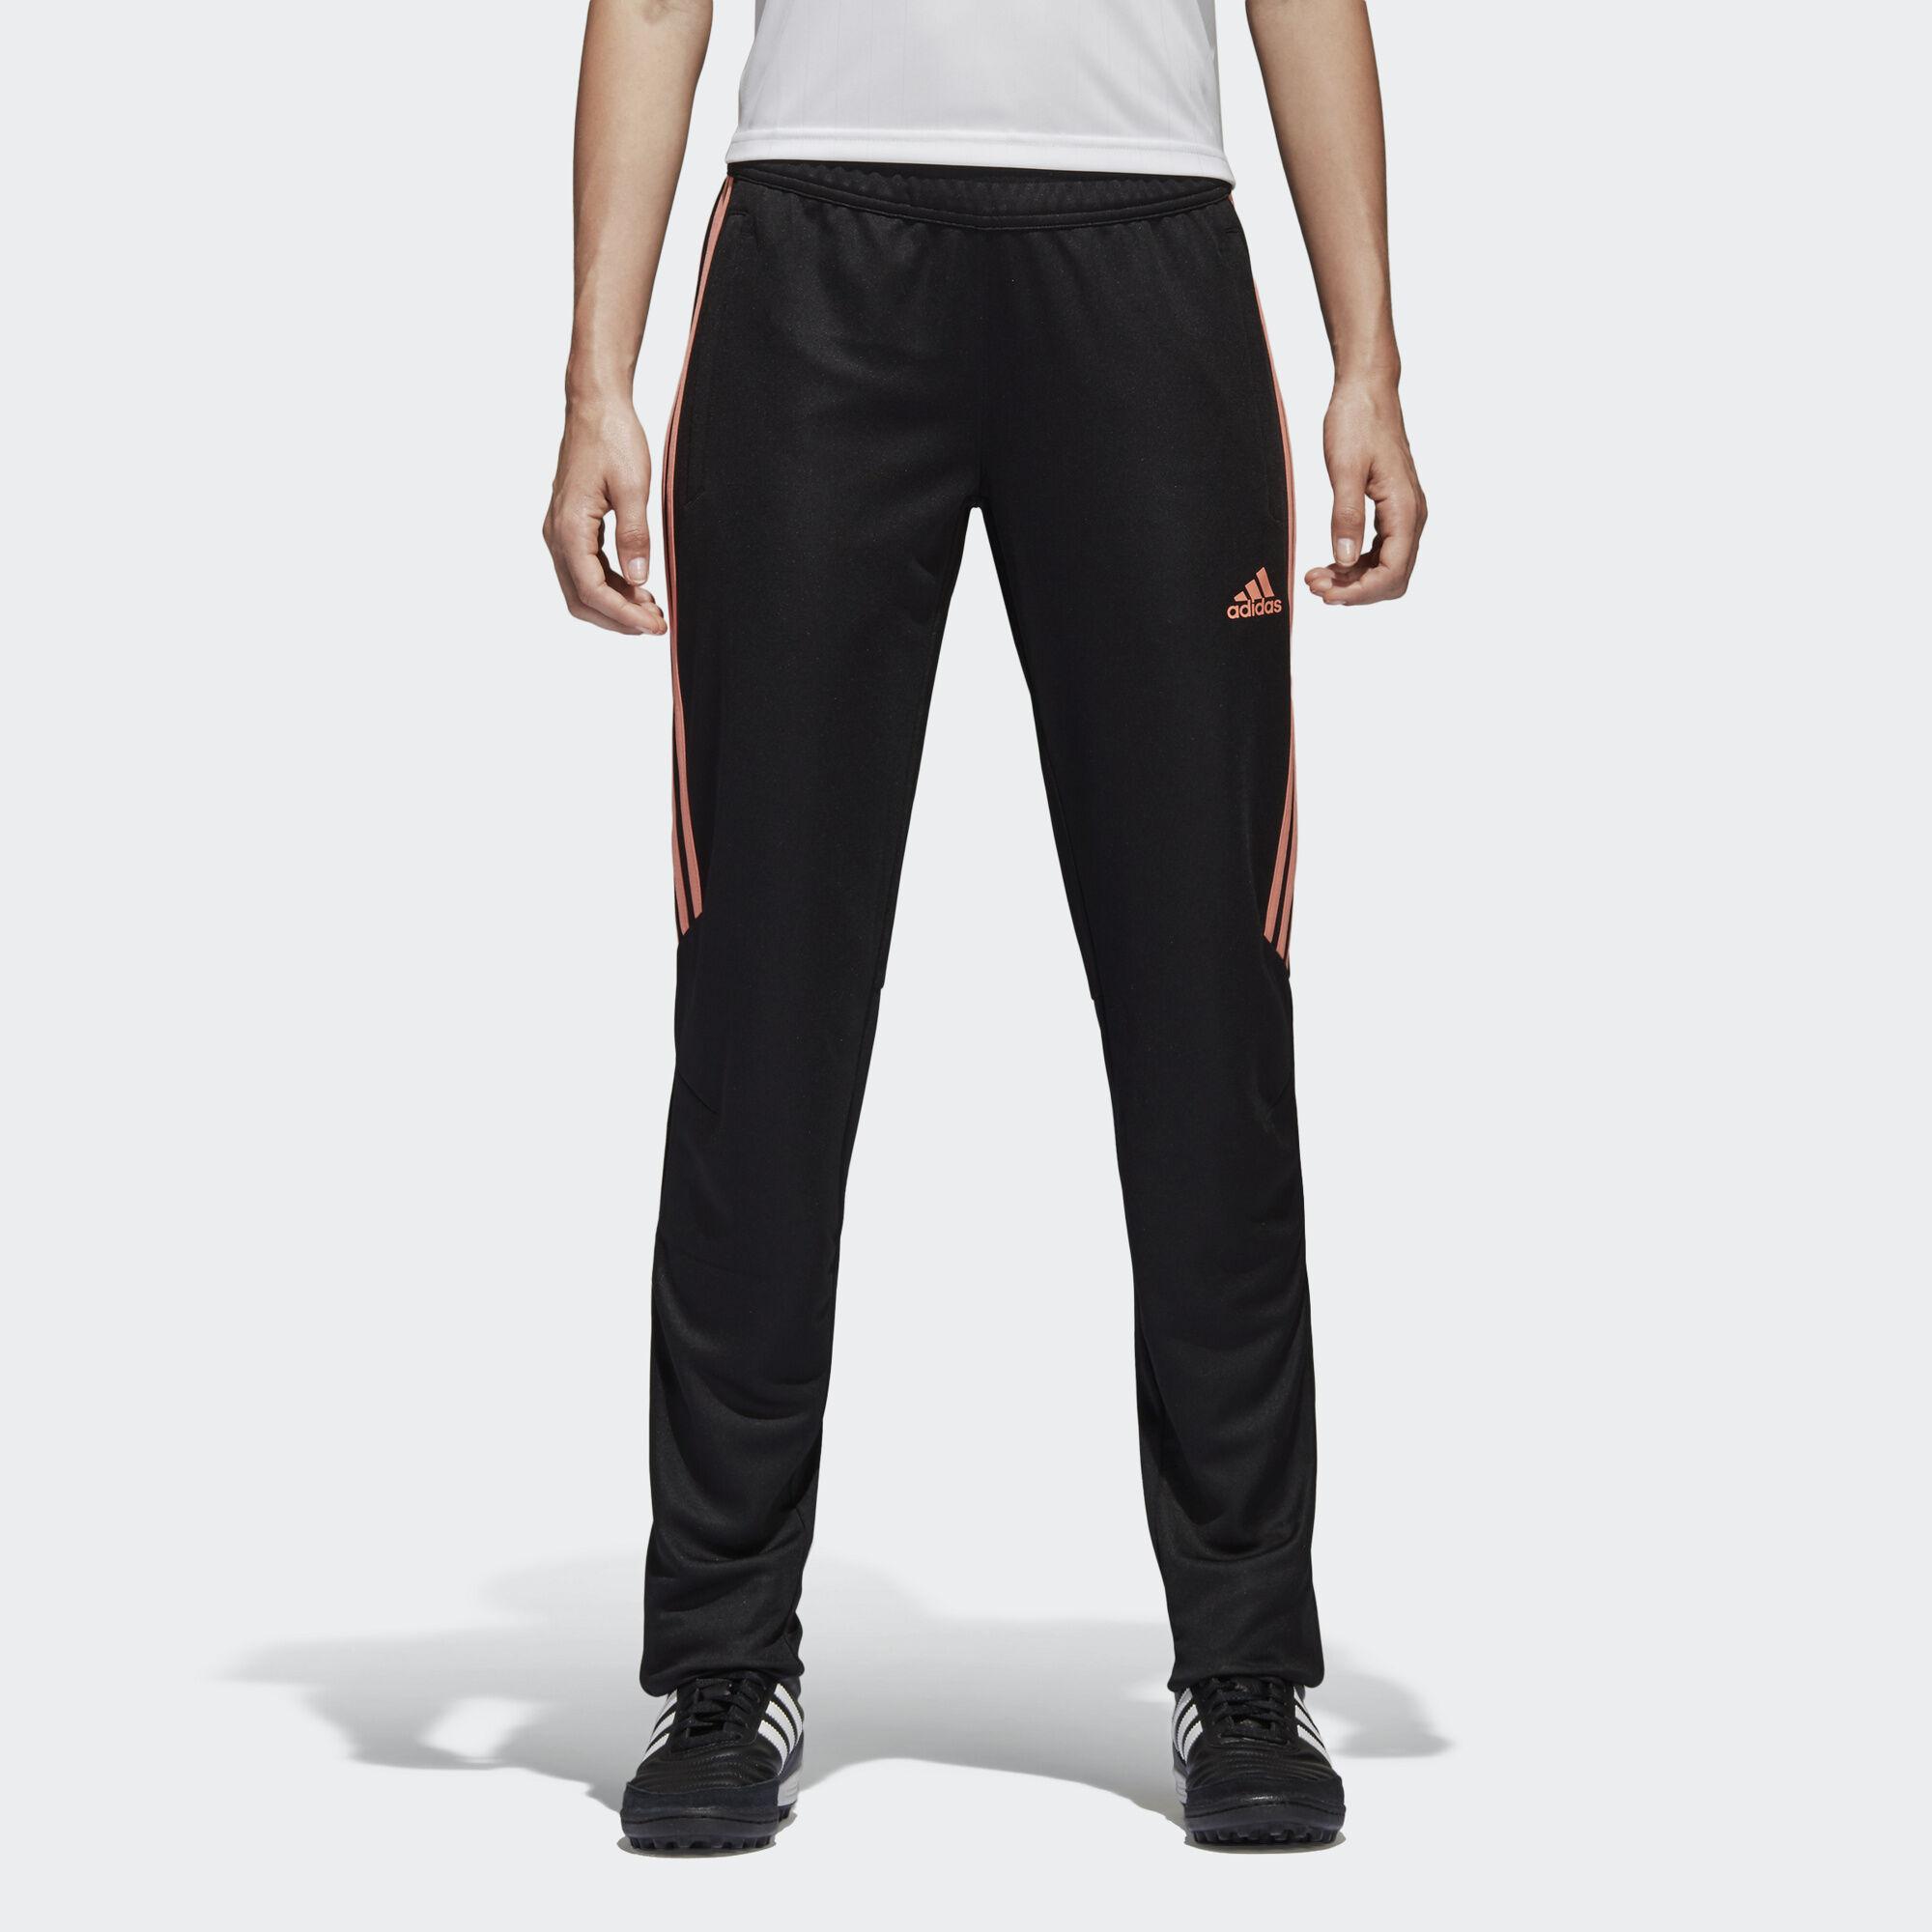 adidas-Tiro-17-Training-Pants-Women-039-s